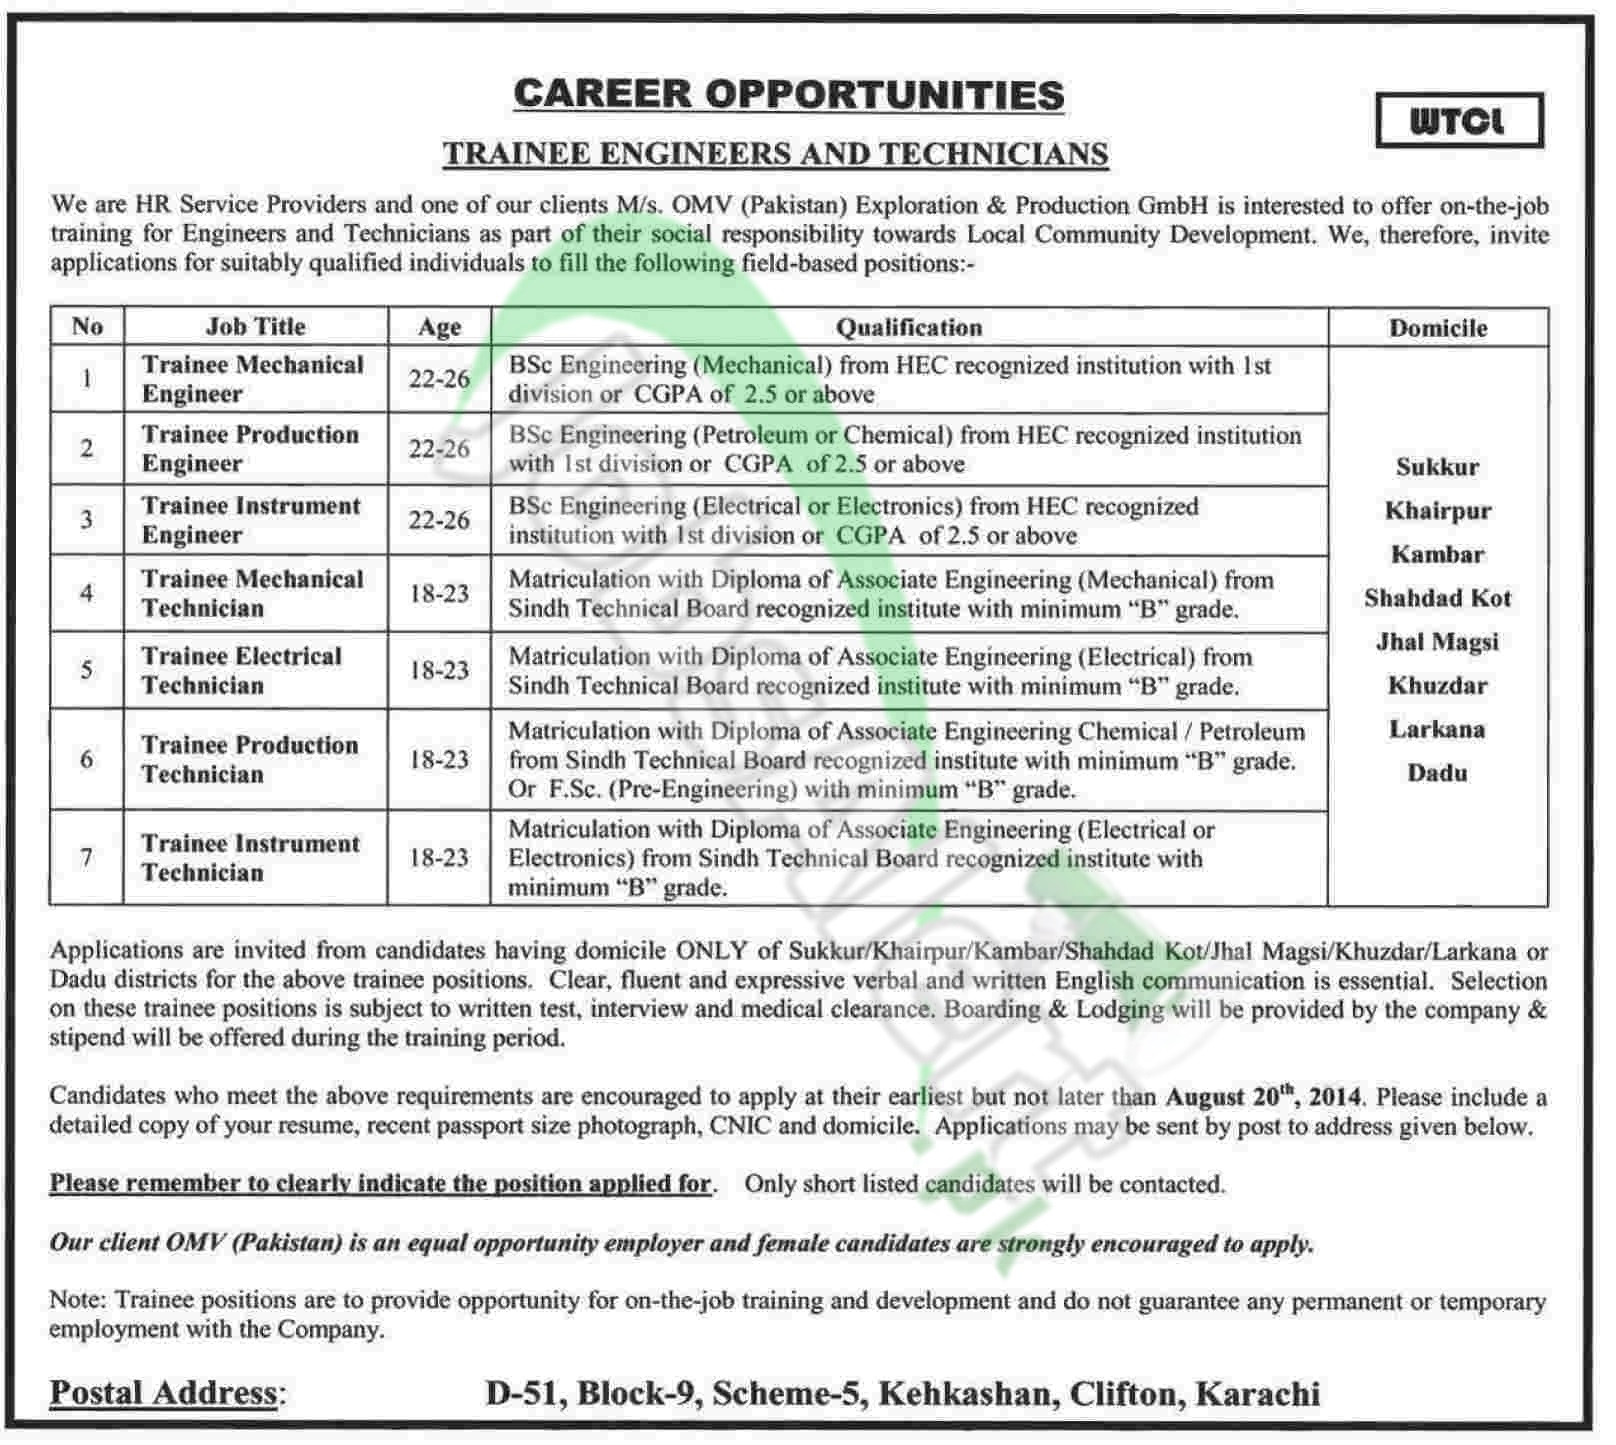 OMV Pakistan Exploration & Production GmbH, Karachi